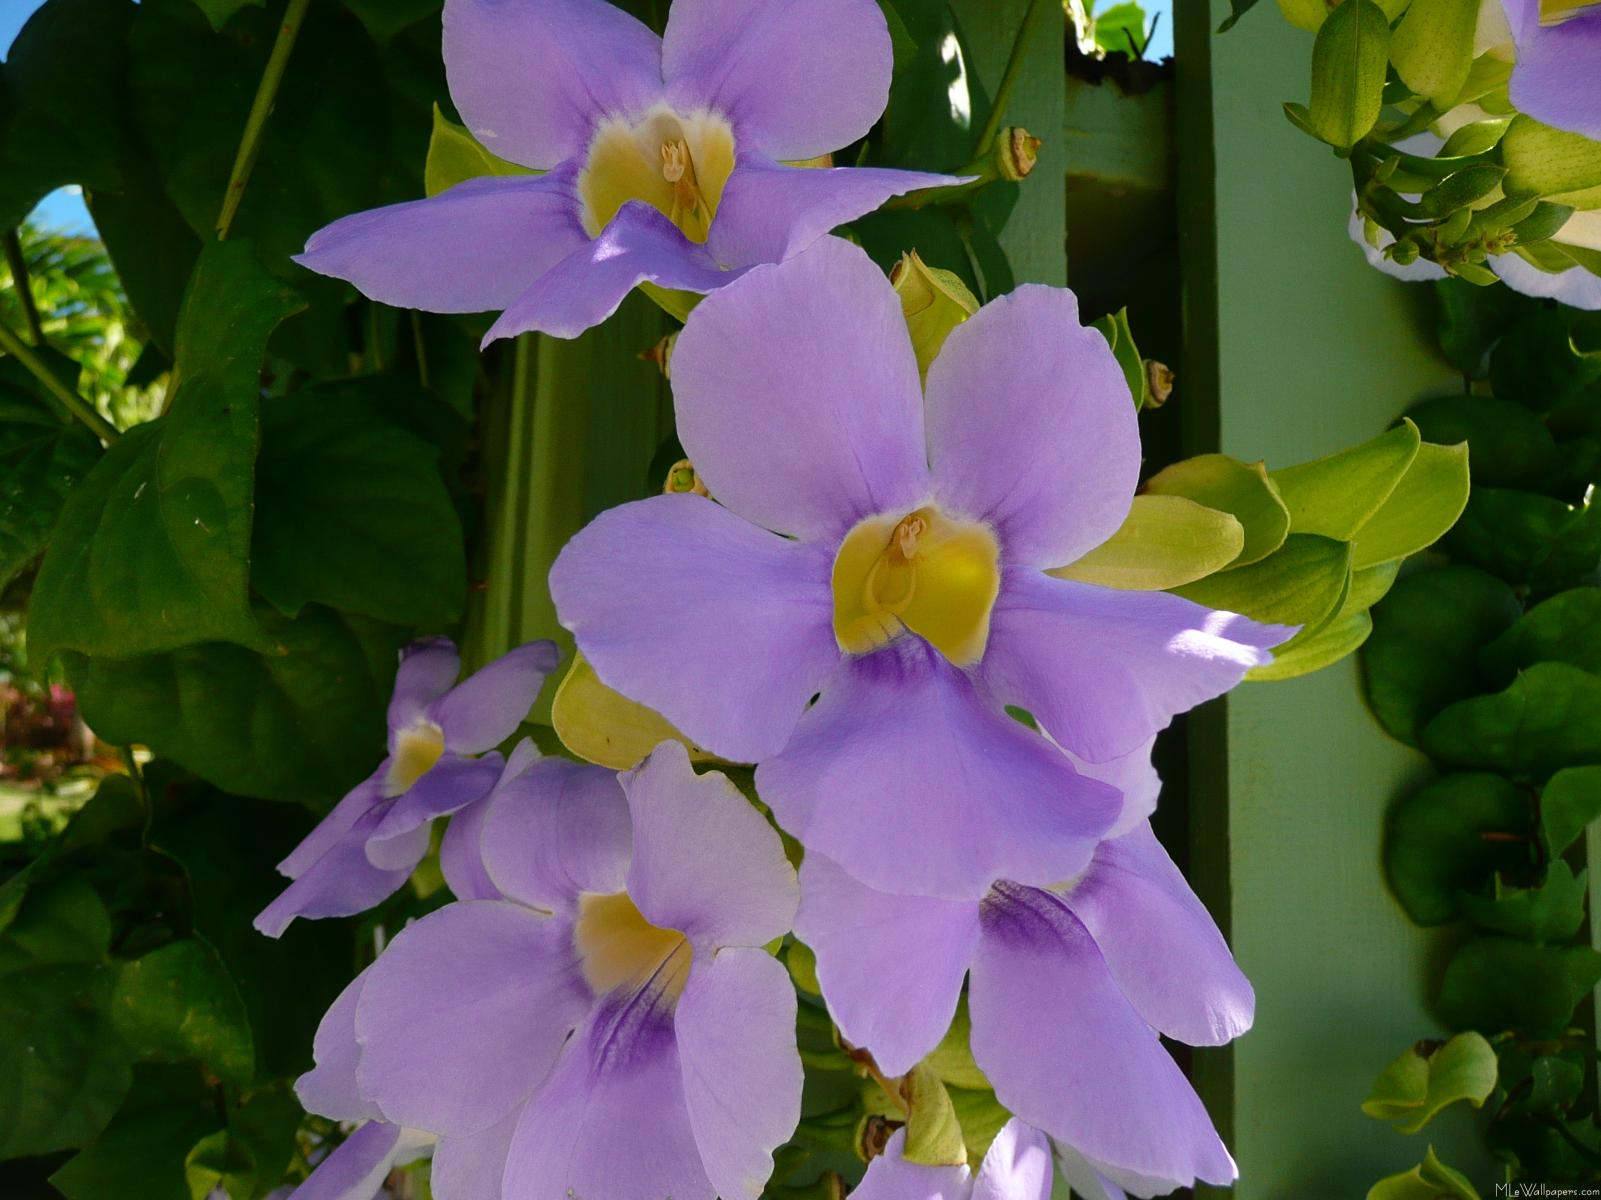 Mlewallpapers sky flower vine sky flower vine izmirmasajfo